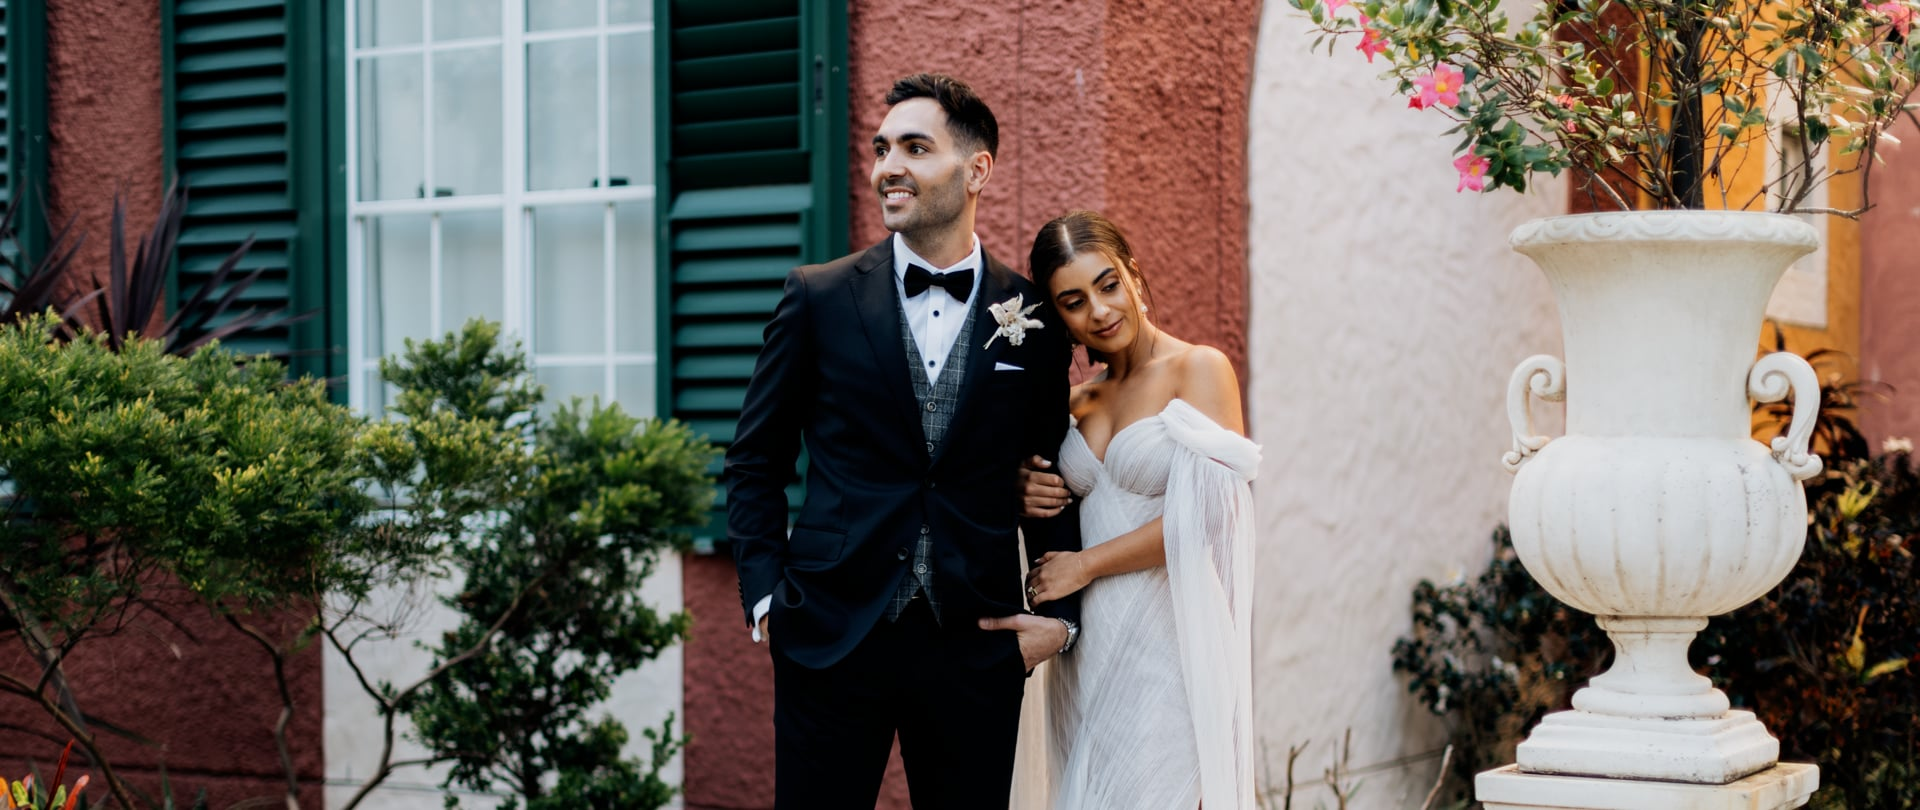 Erato & Rhys Wedding Video Filmed at Gold Coast, Queensland